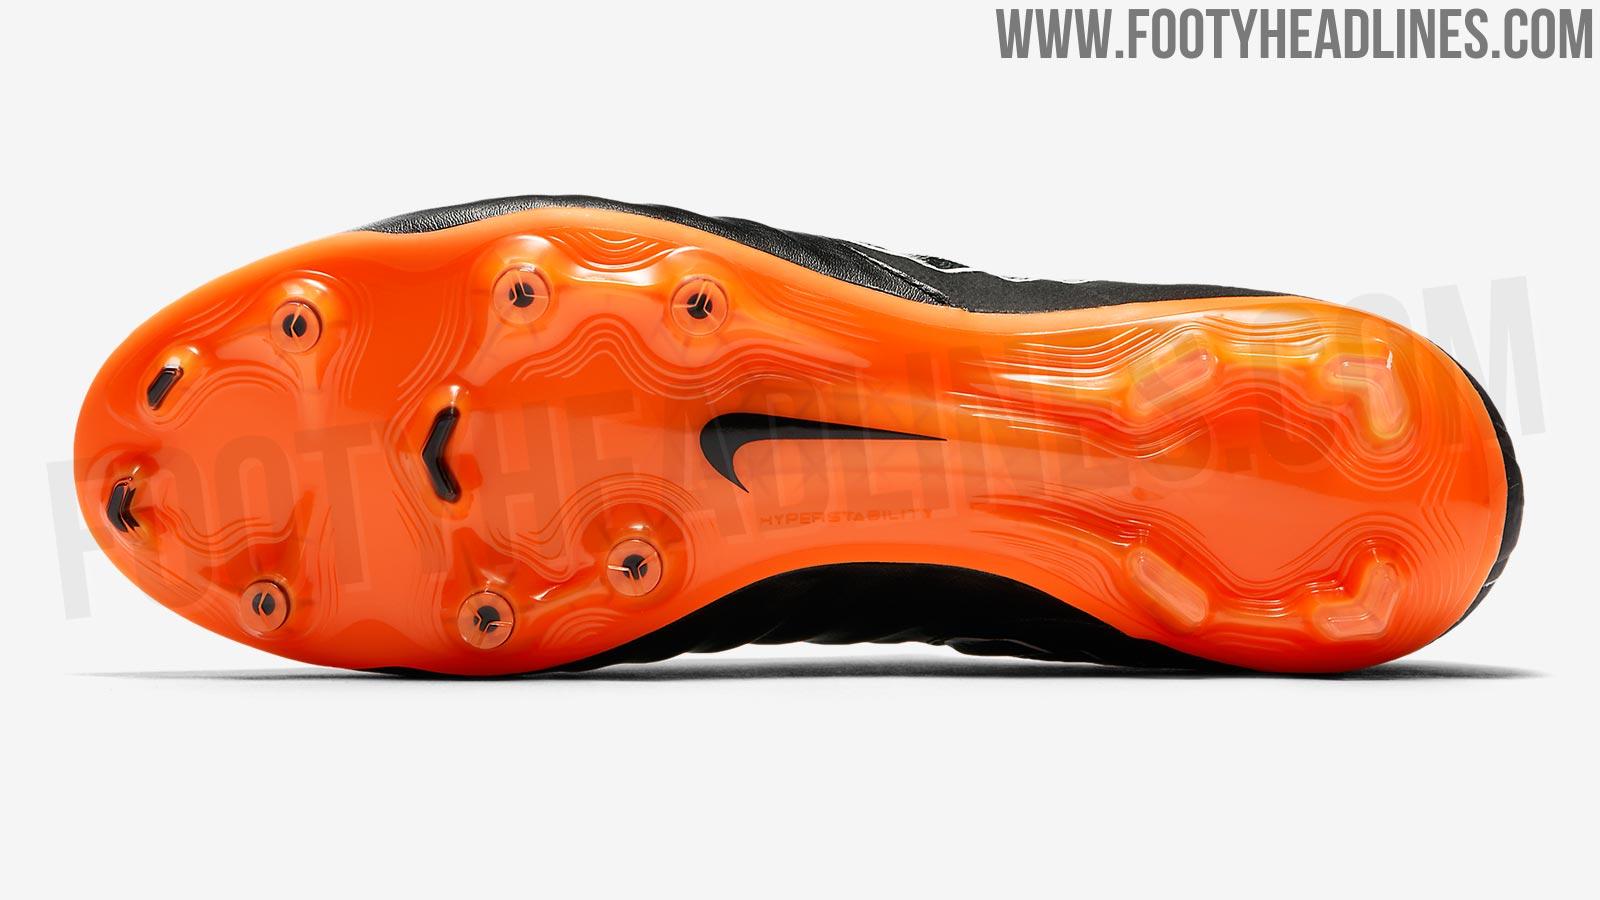 newest 7999f da17b Nike Tiempo Legend 7 Released kick sneaker 0415f 57f03 Tech-wise, ...